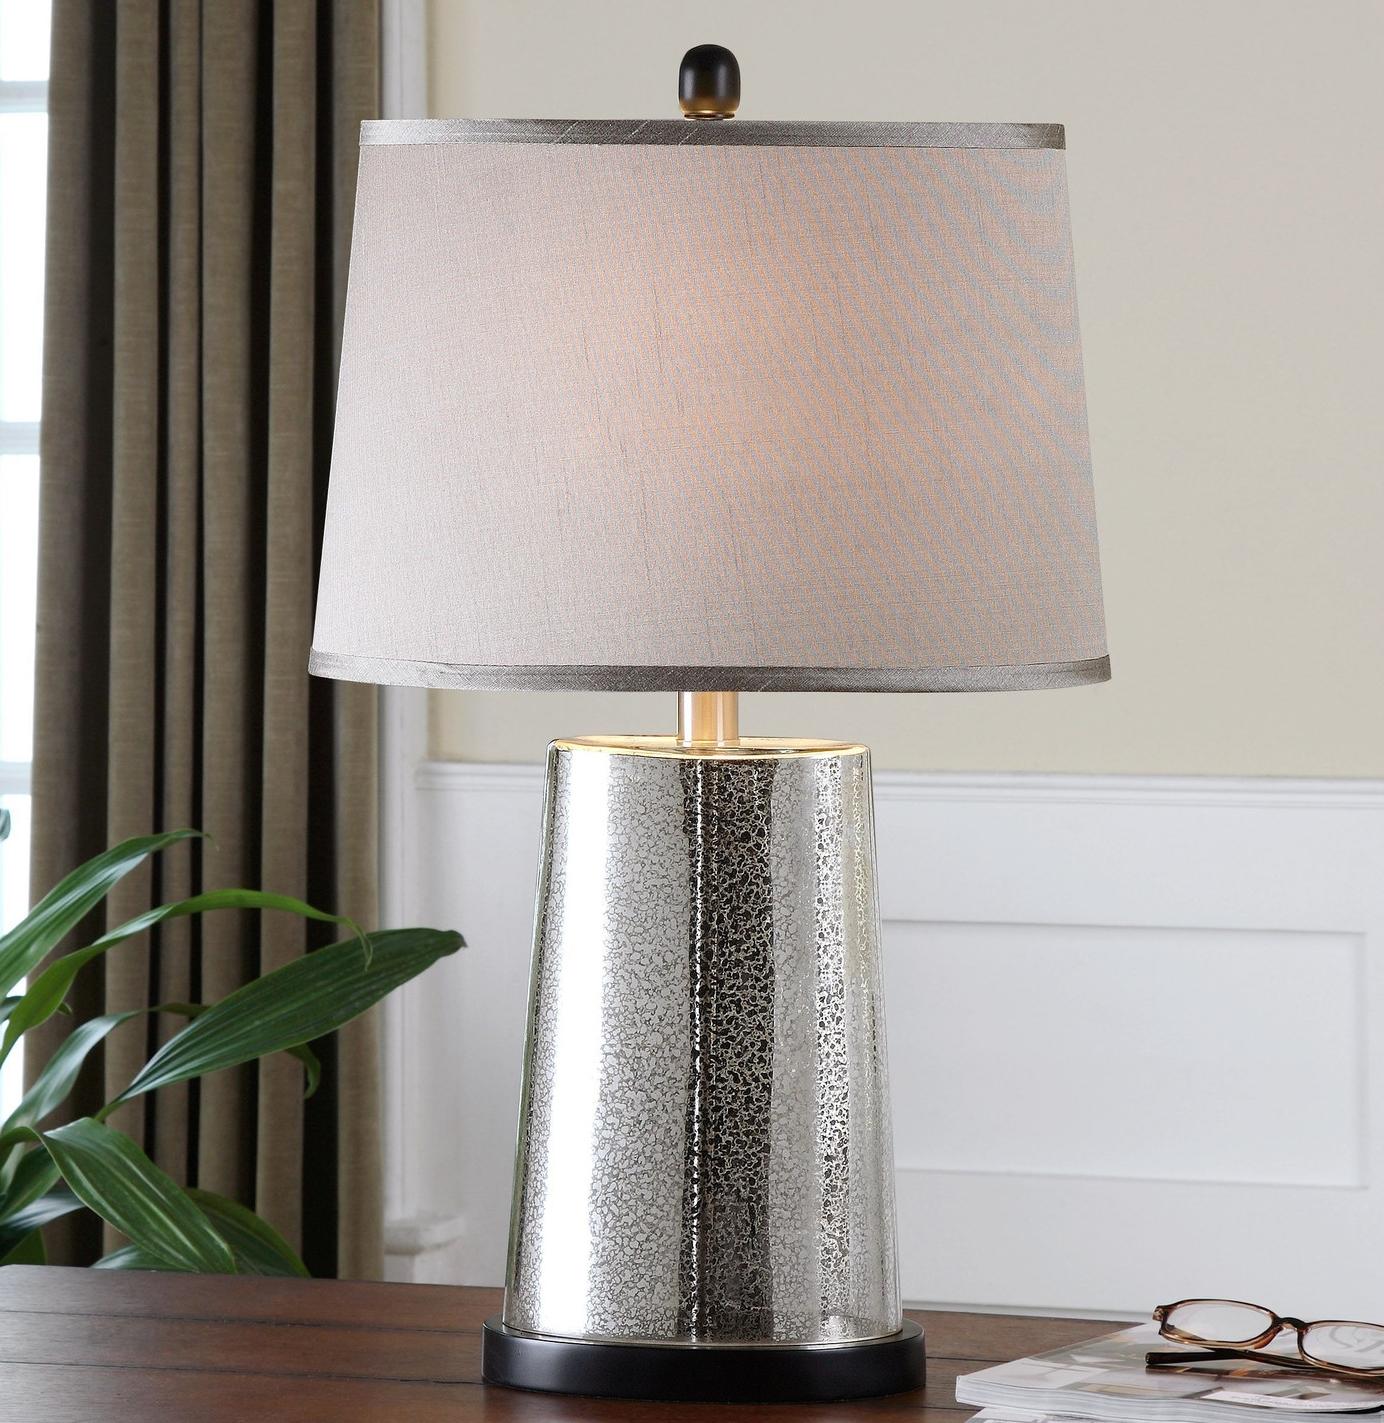 Binga+Table+Lamp.jpg